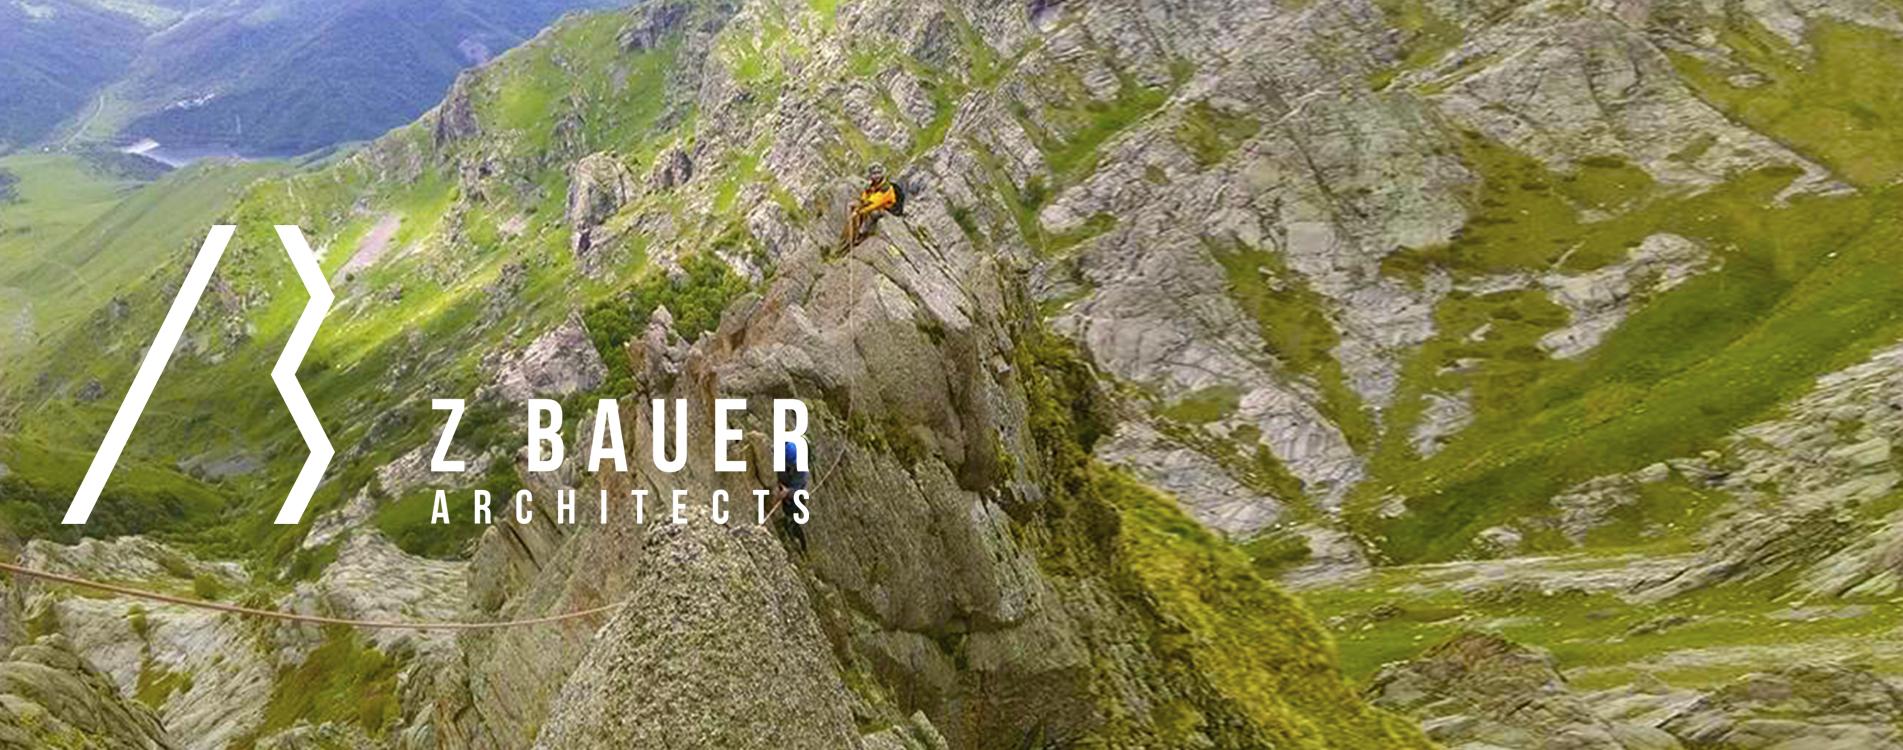 Zohrab Bauer Architect Philosophy Nature 23